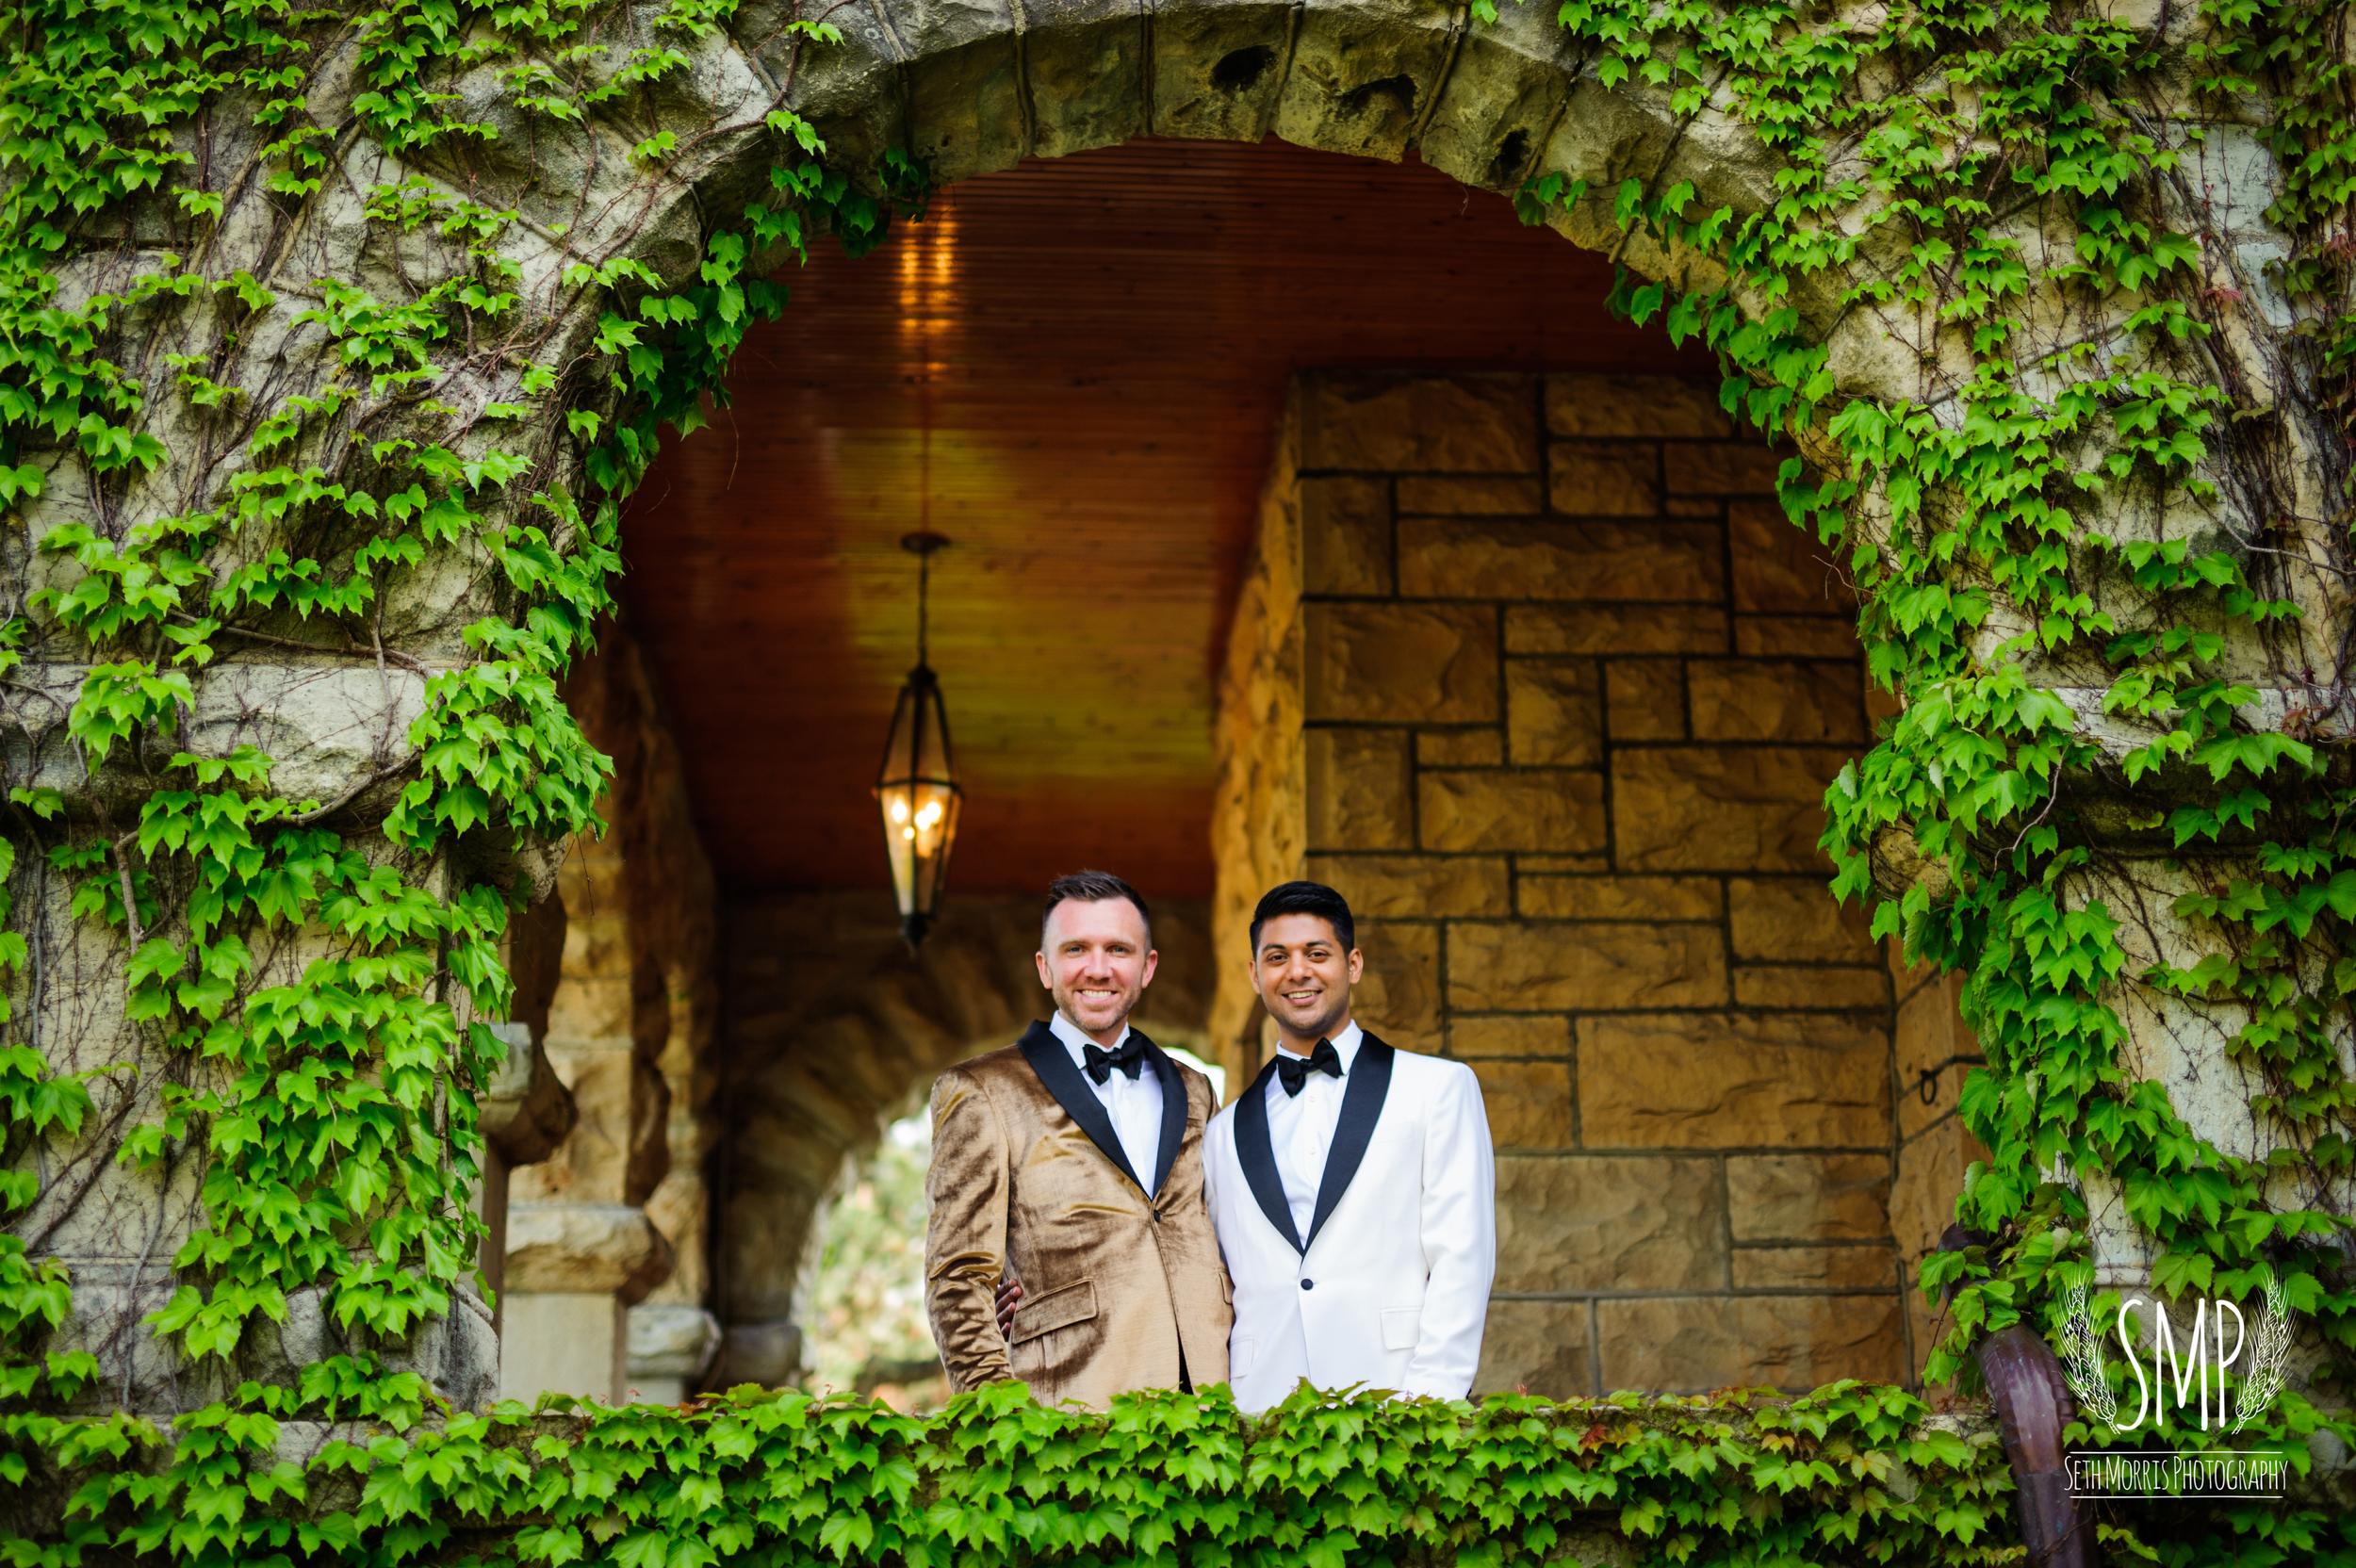 same-sex-wedding-photographer-chicago-illinois-14.jpg